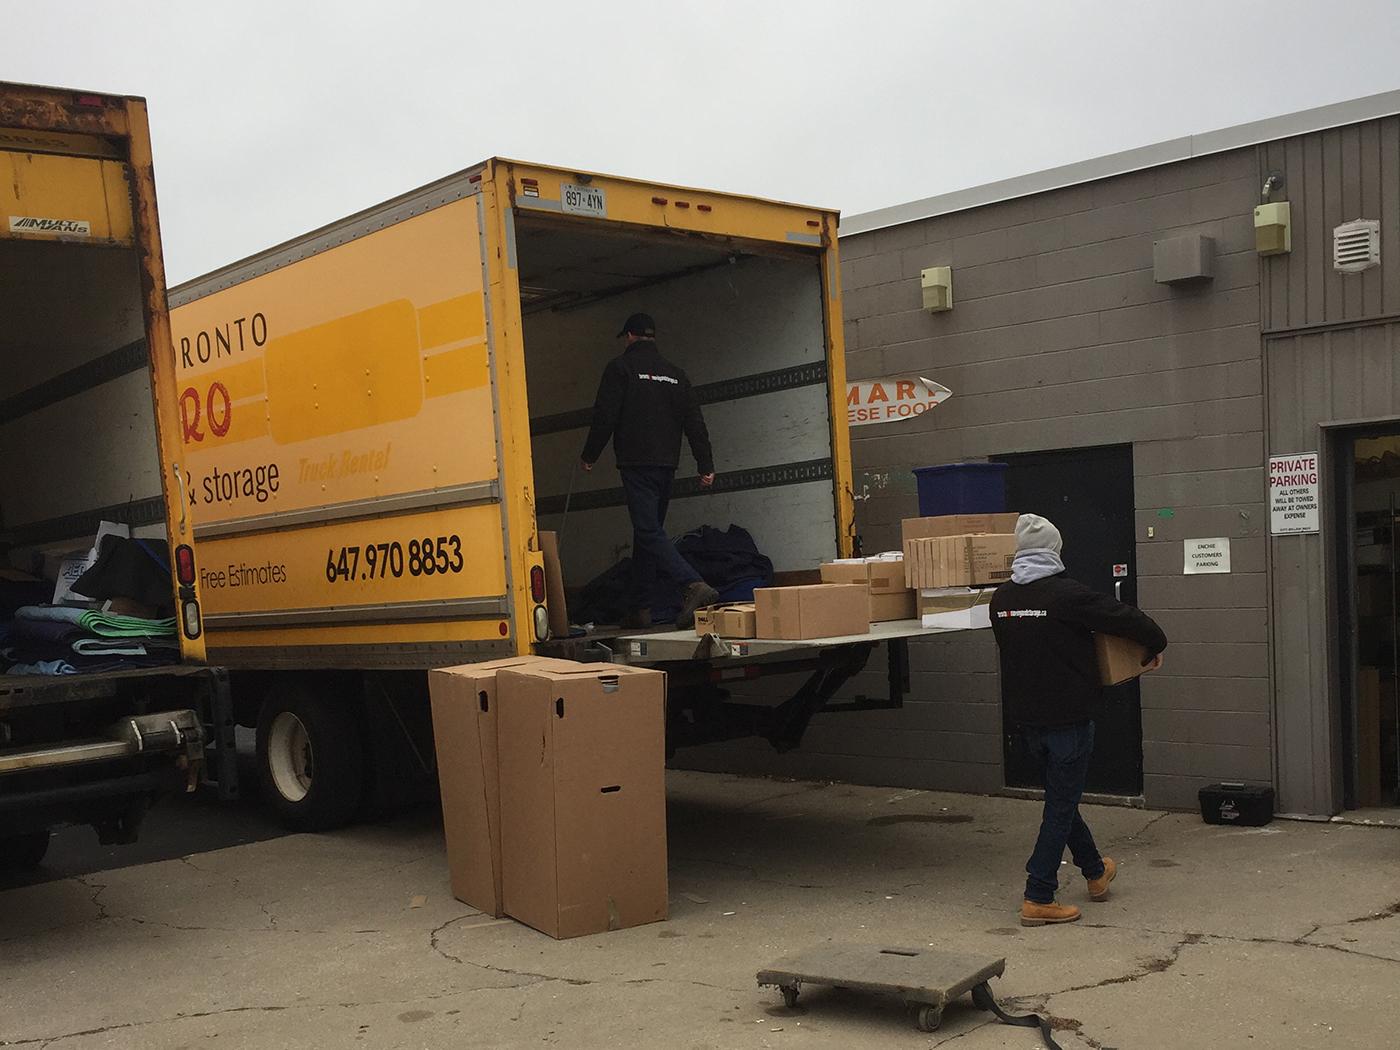 Moving Company Toronto Preparing Trucks